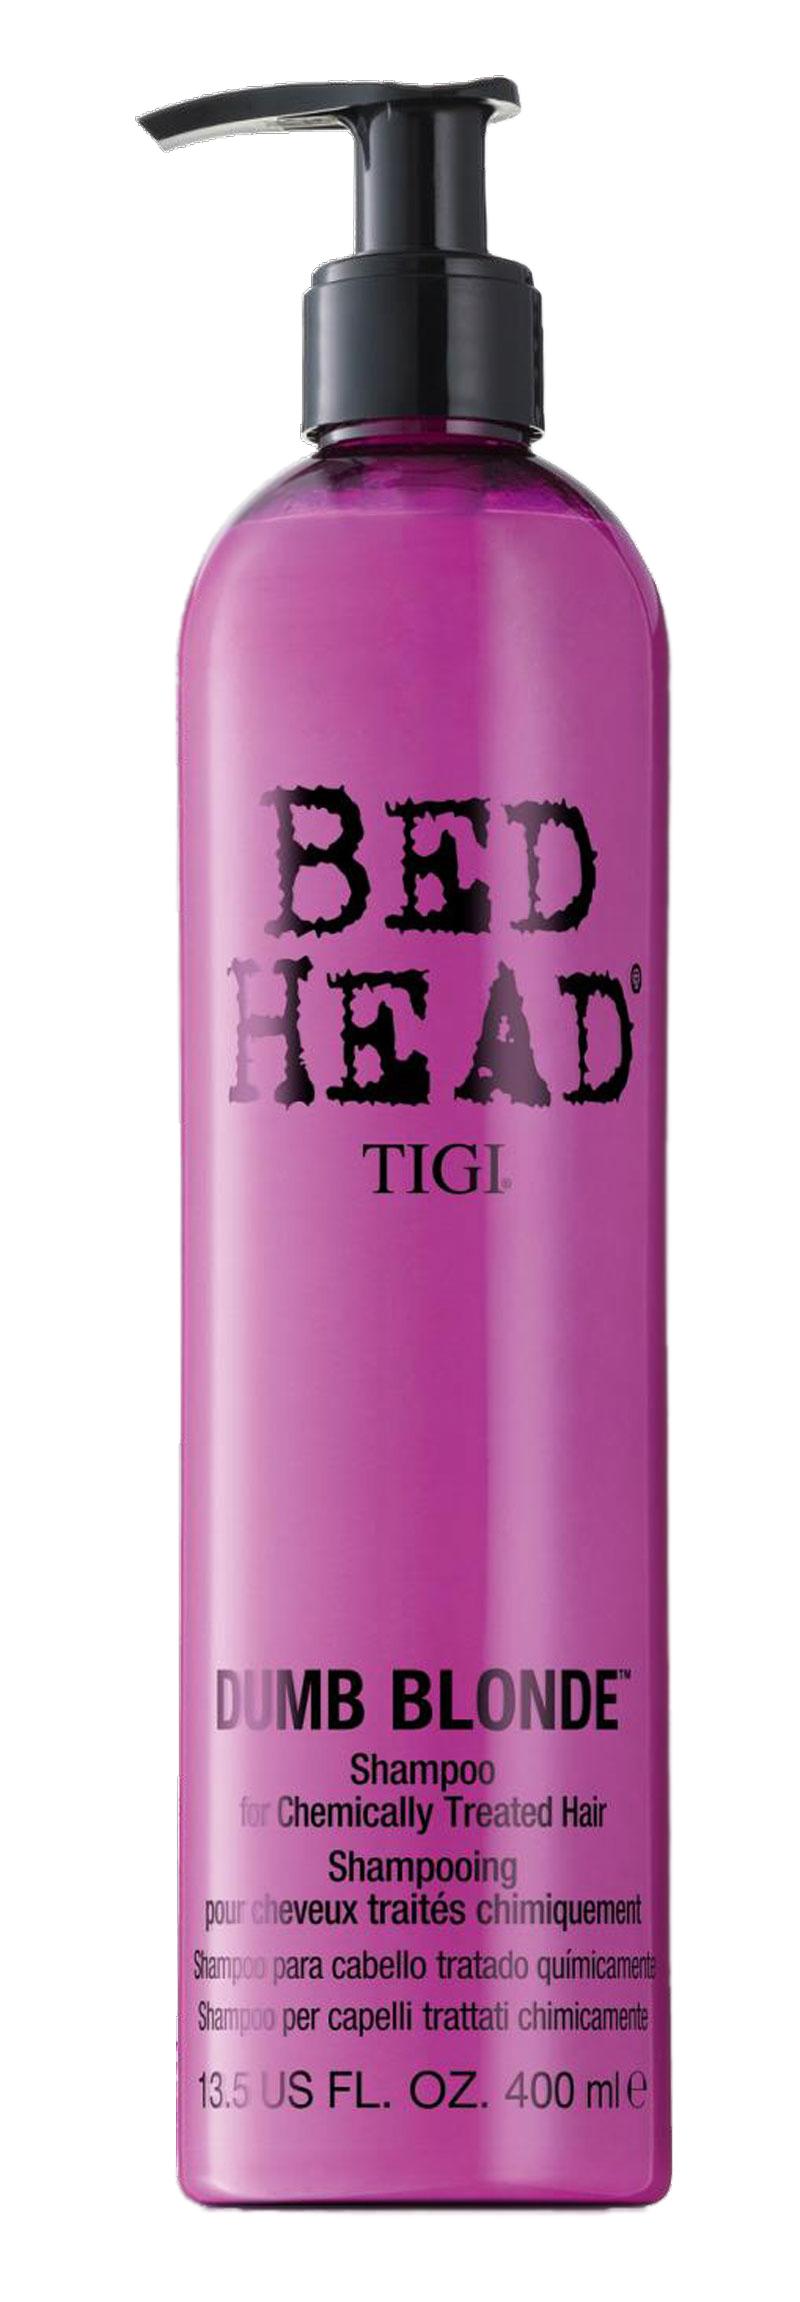 tigi bed head dumb blonde shampoo 400 ml cosmo onlineshop. Black Bedroom Furniture Sets. Home Design Ideas